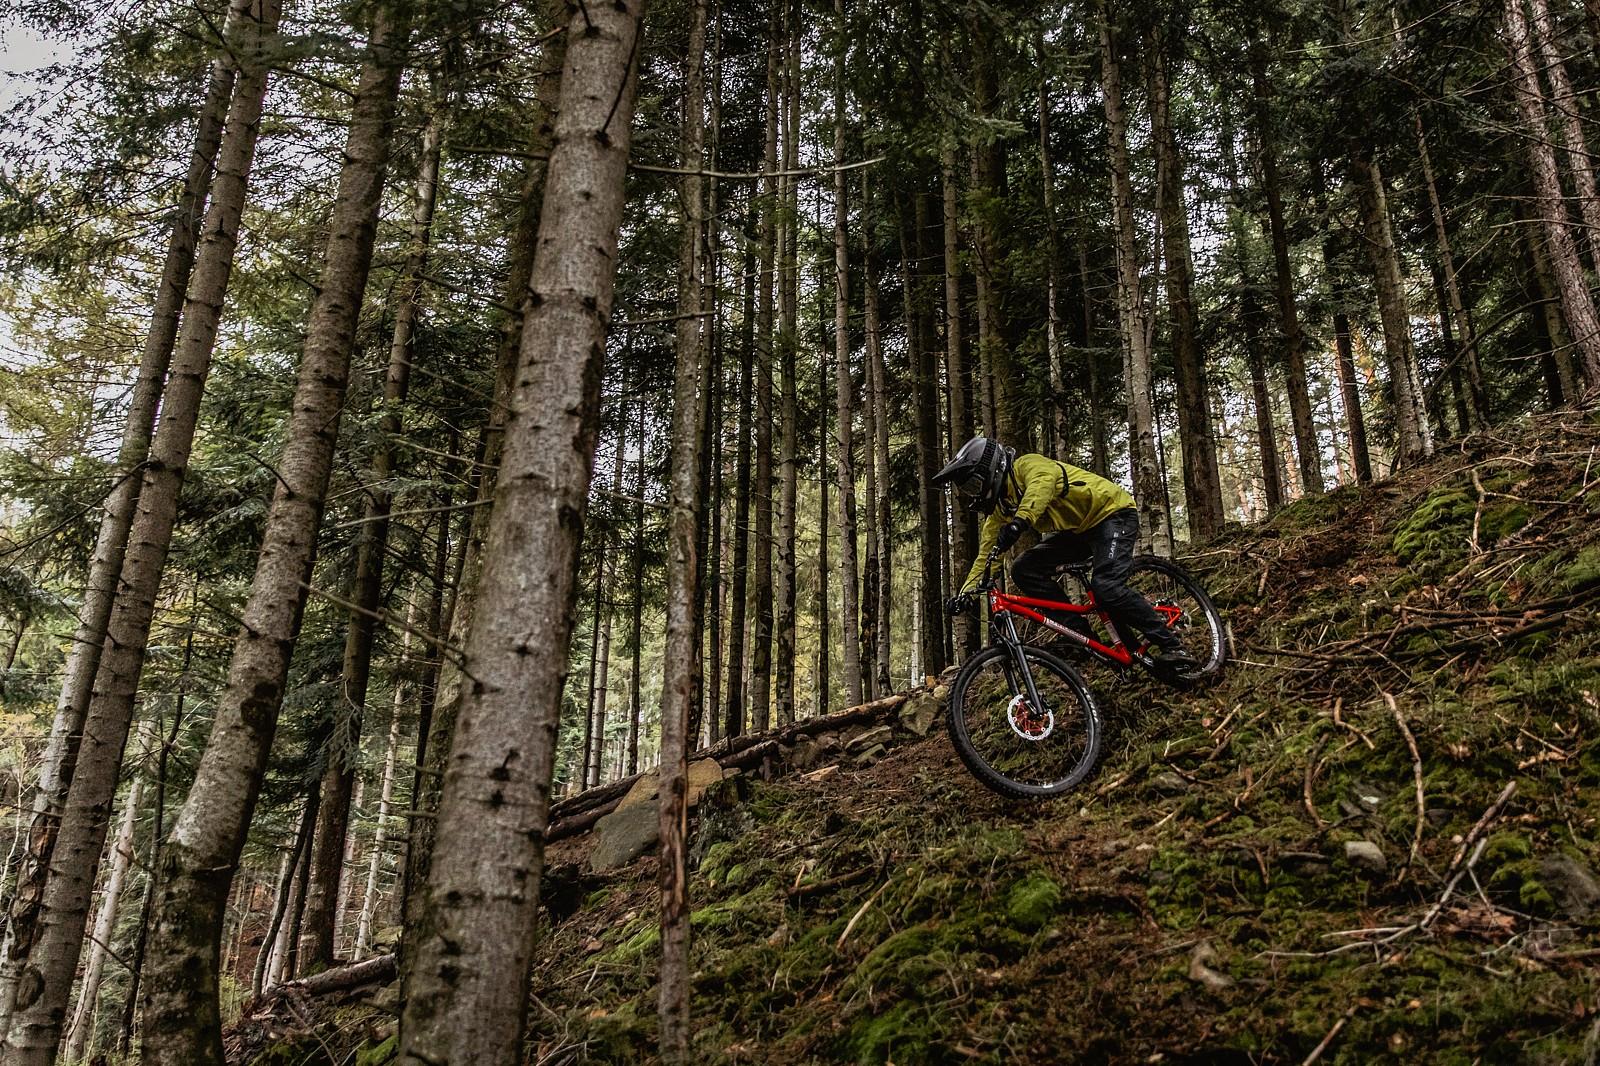 fresh loam - Banan - Mountain Biking Pictures - Vital MTB